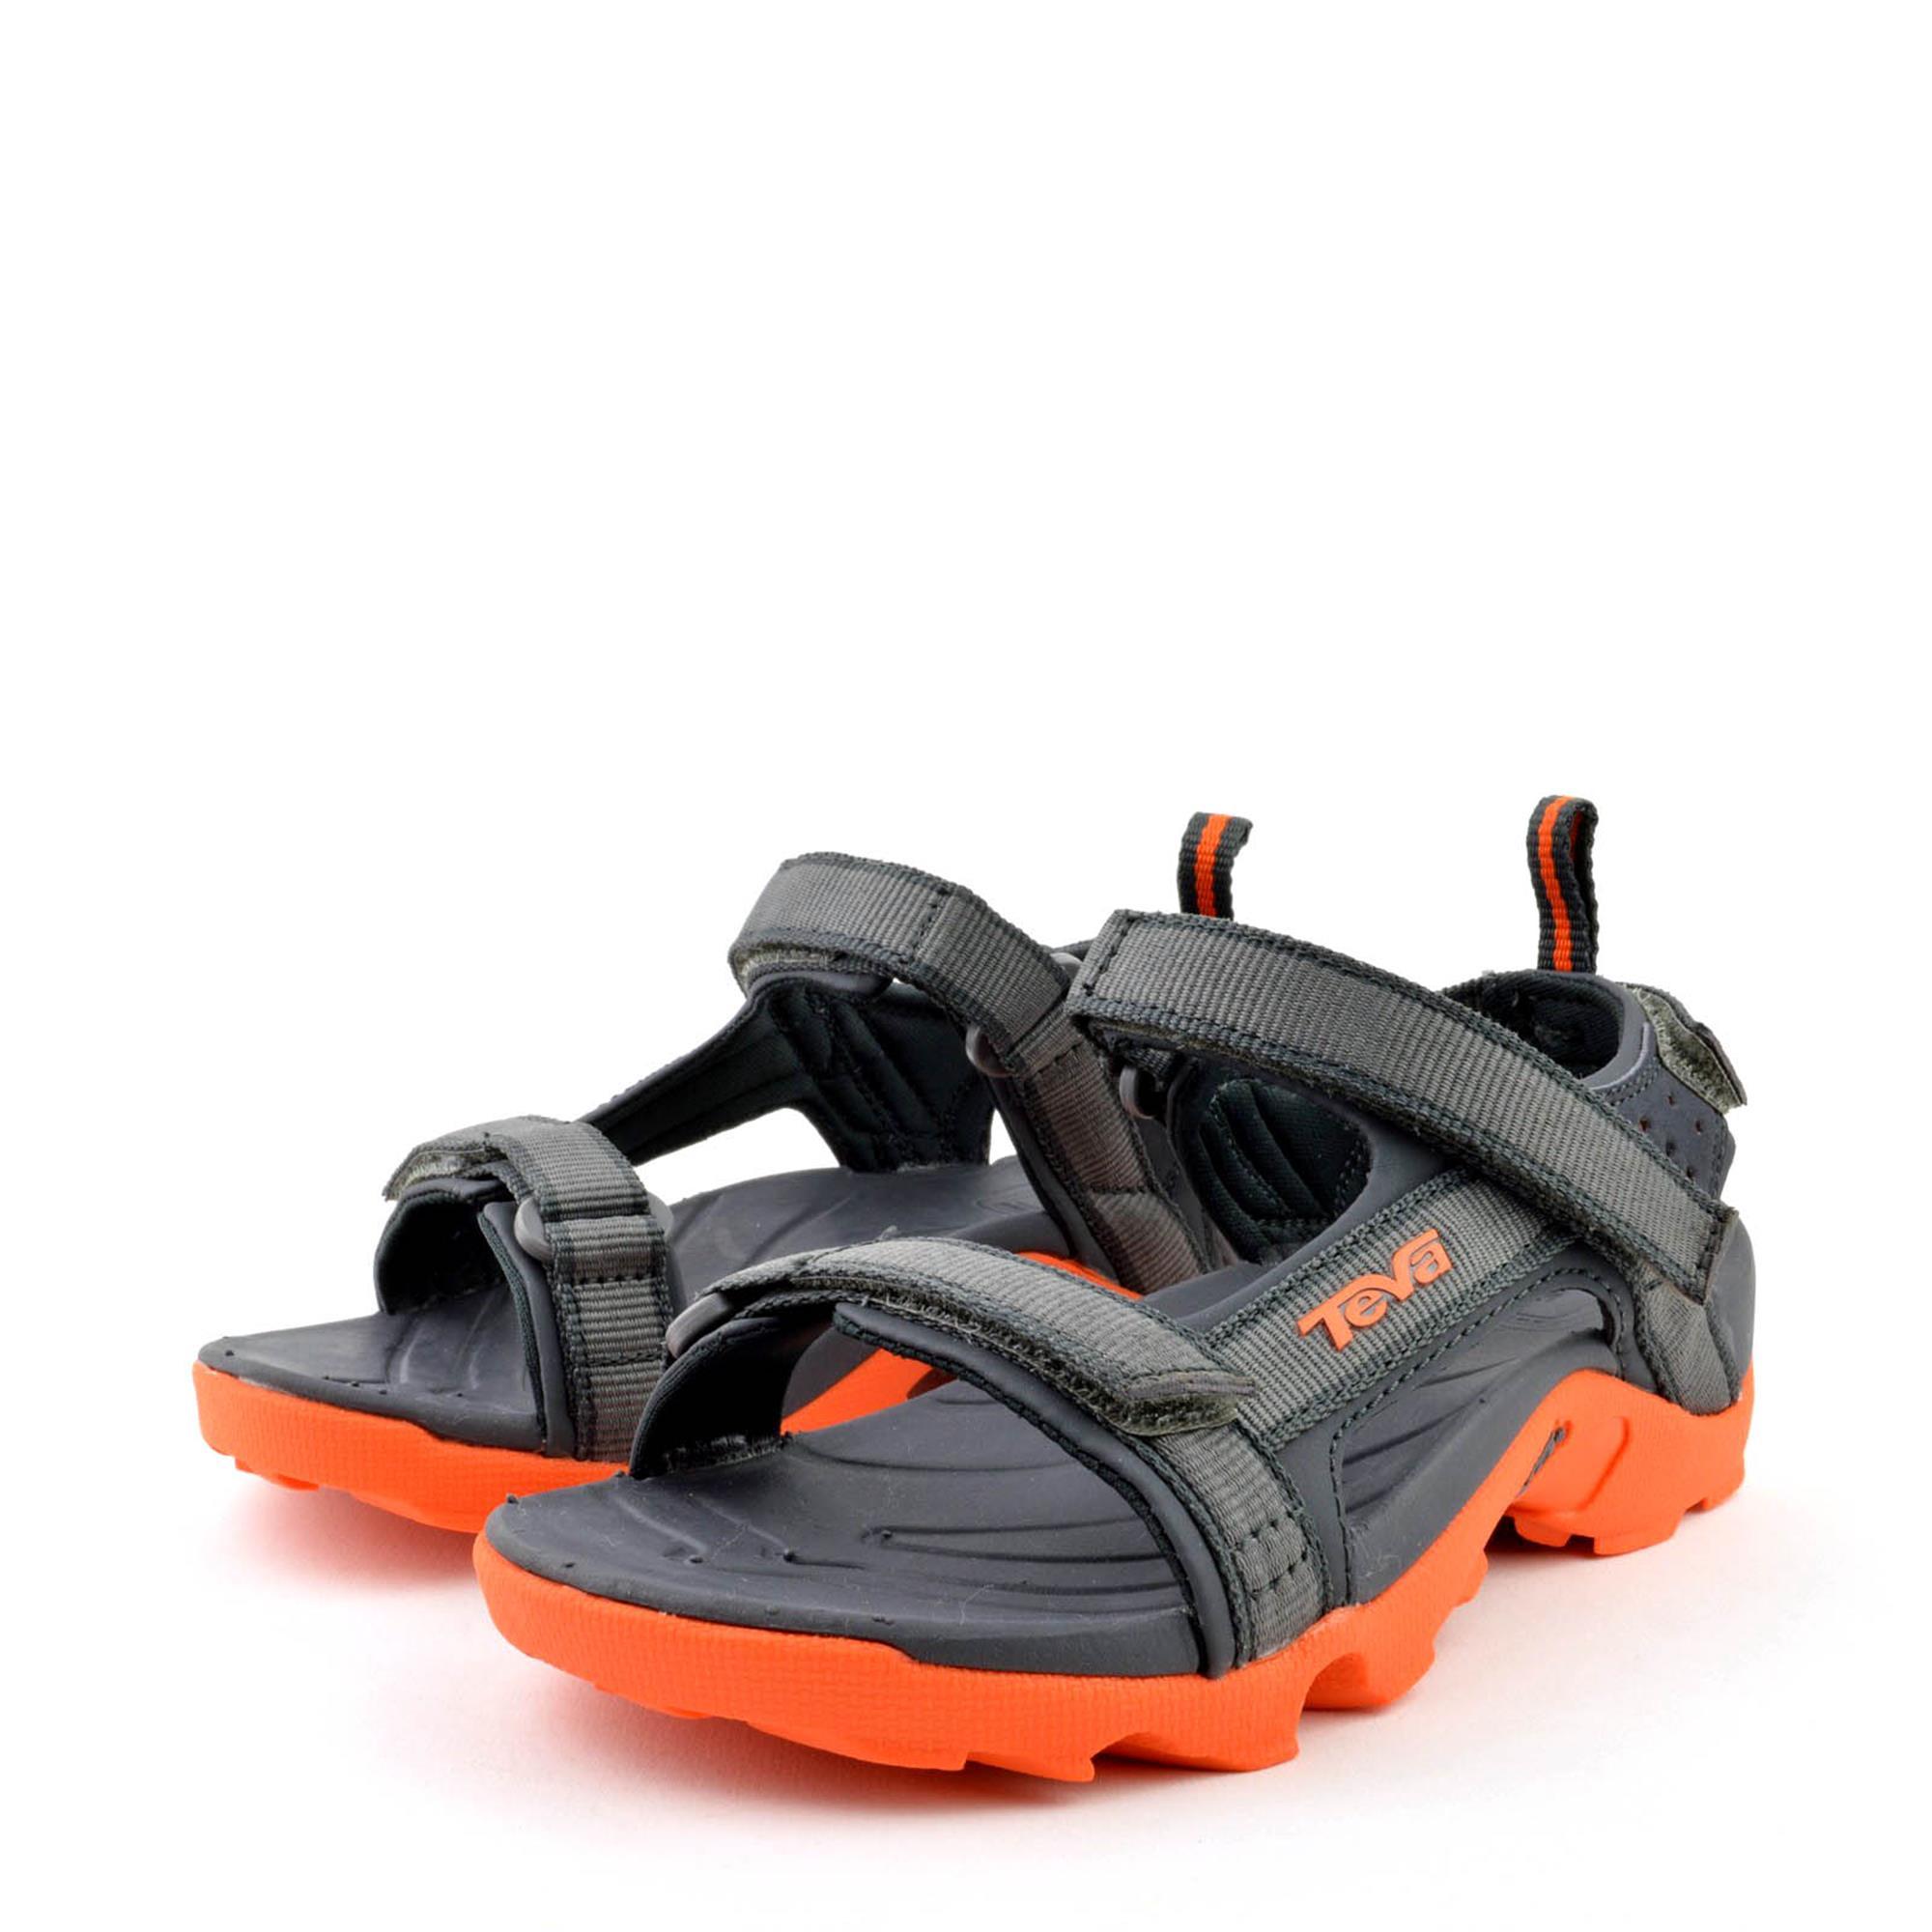 teva tanza kindersandale outdoor sandale grey orange ebay. Black Bedroom Furniture Sets. Home Design Ideas